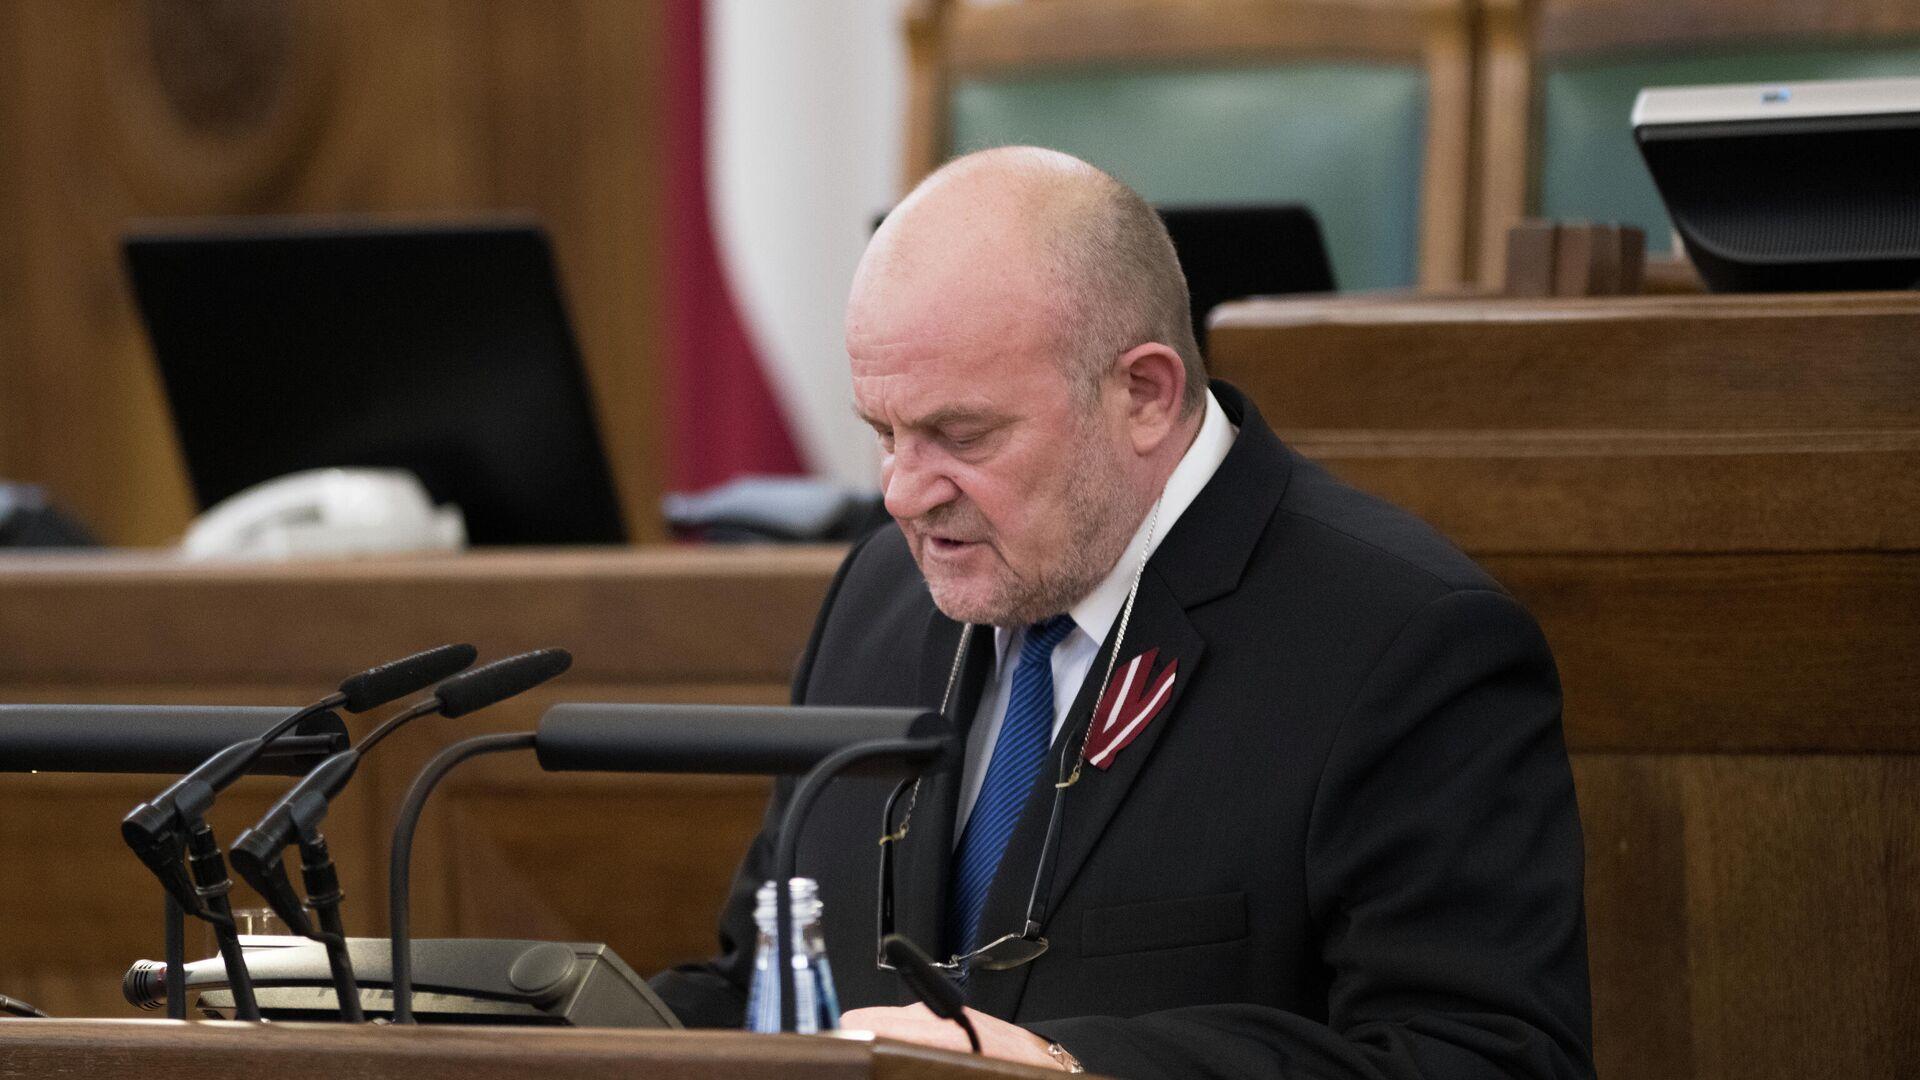 Депутат Сейма Латвии Янис Адамсонс - Sputnik Латвия, 1920, 14.10.2021